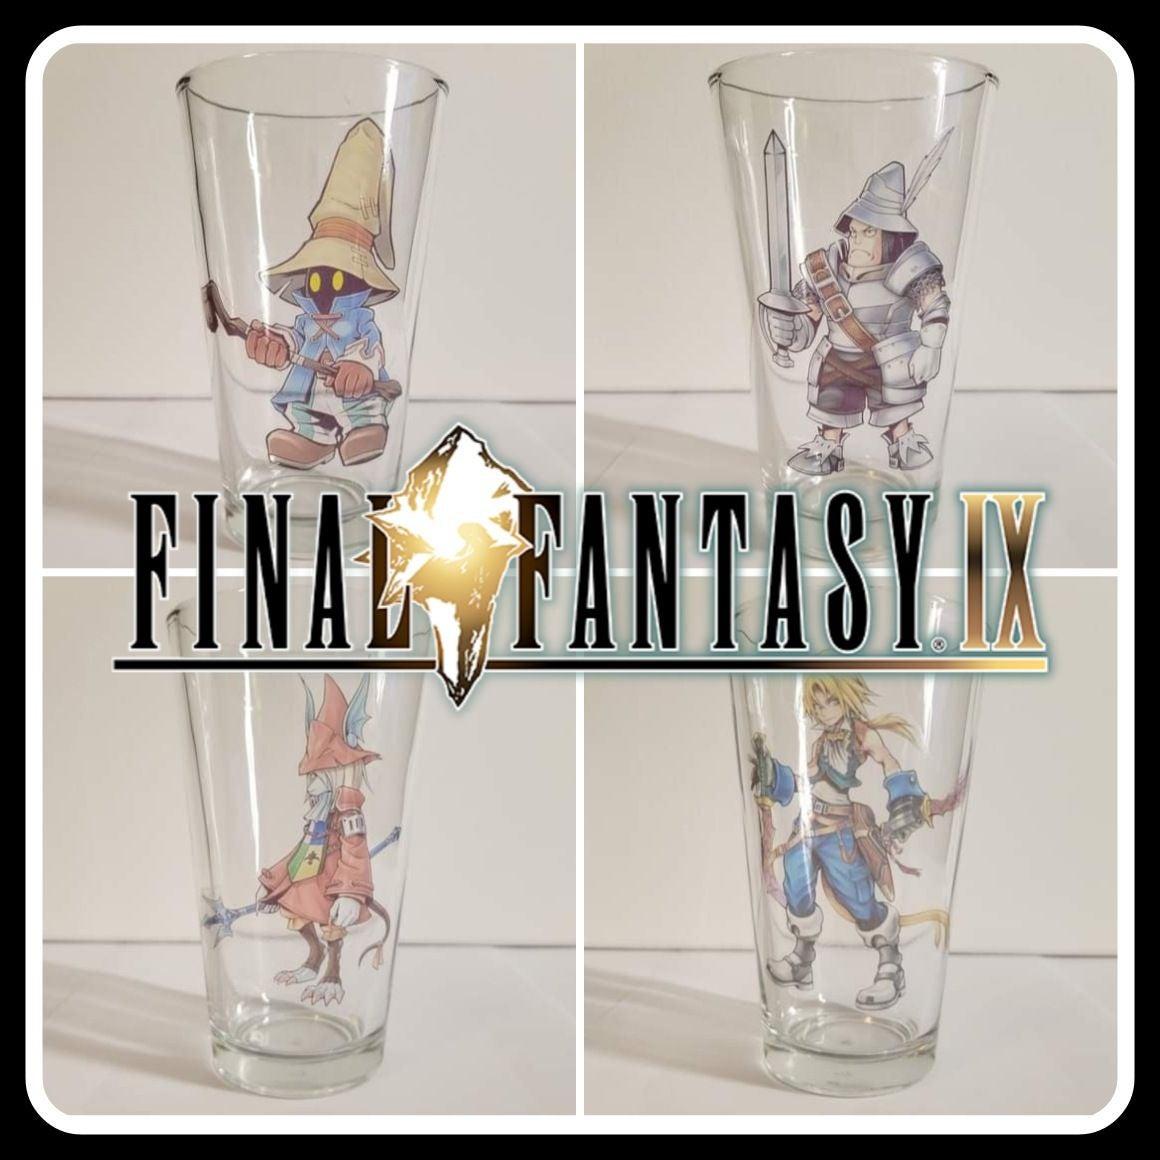 Set of 4 Custom Final Fantasy IX PlaySta